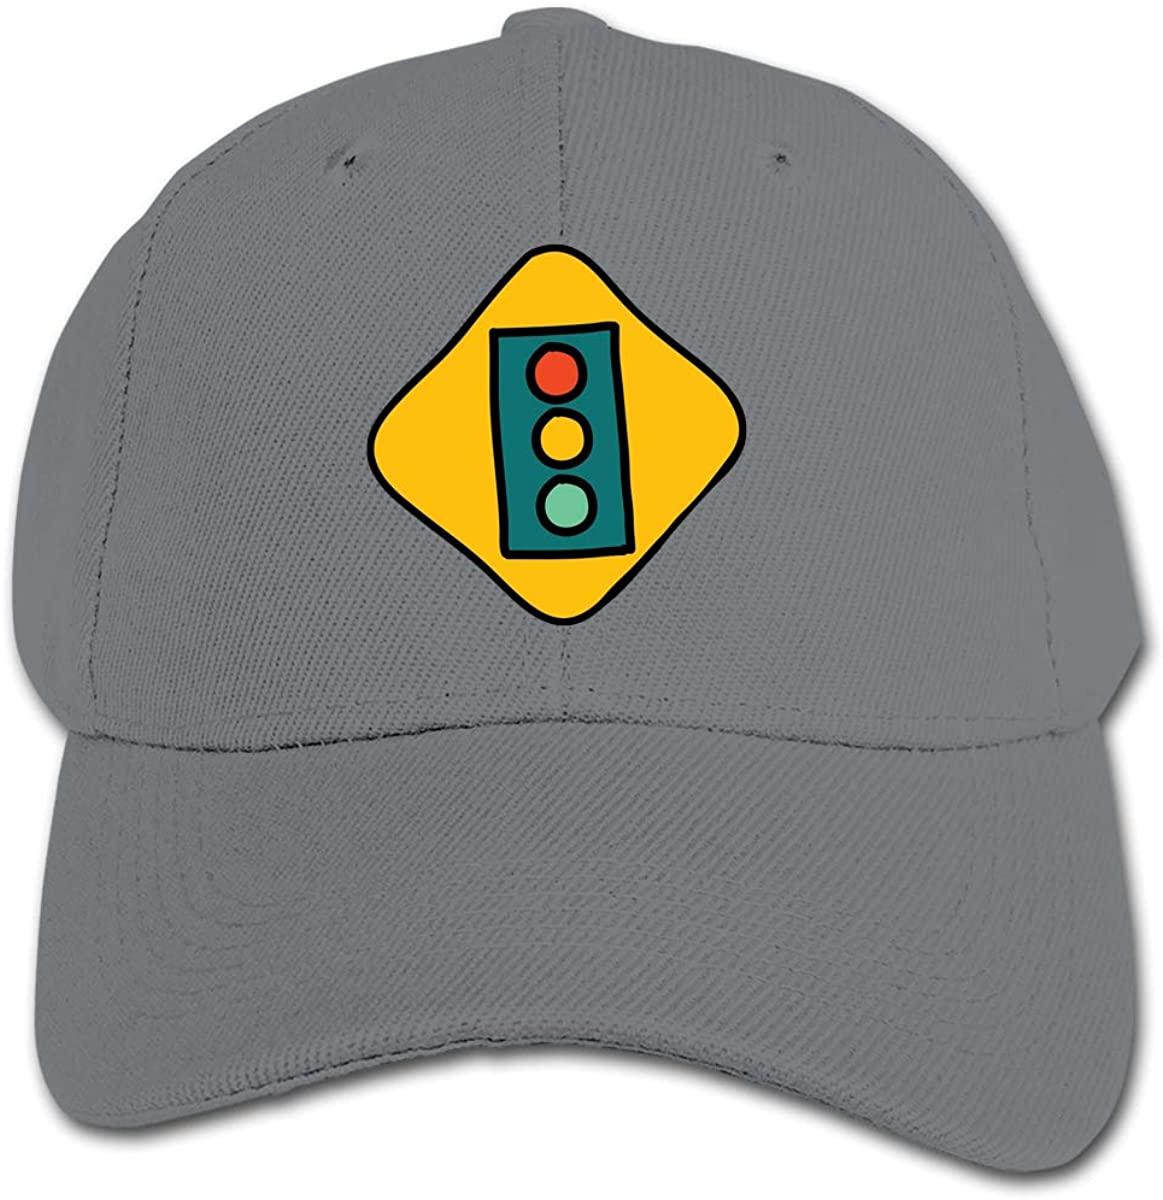 Traffic Lights Kid's Daily Sun Protection,Casual, Baseball Cap, Adjustable Cartoon Hat Cap